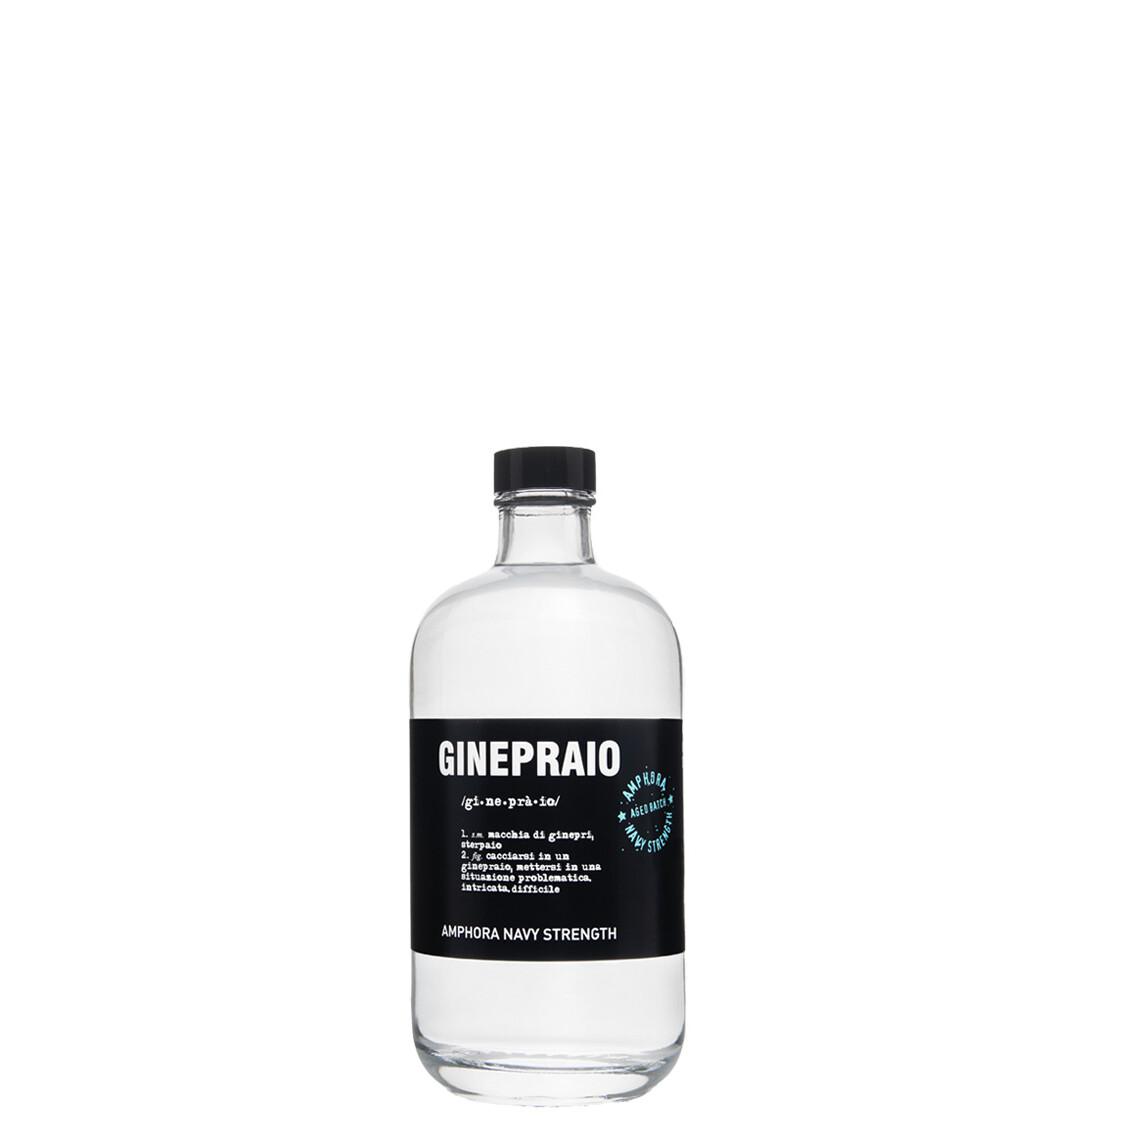 Gin Ginepraio Amphora Navy Strenght di Levante Spirits